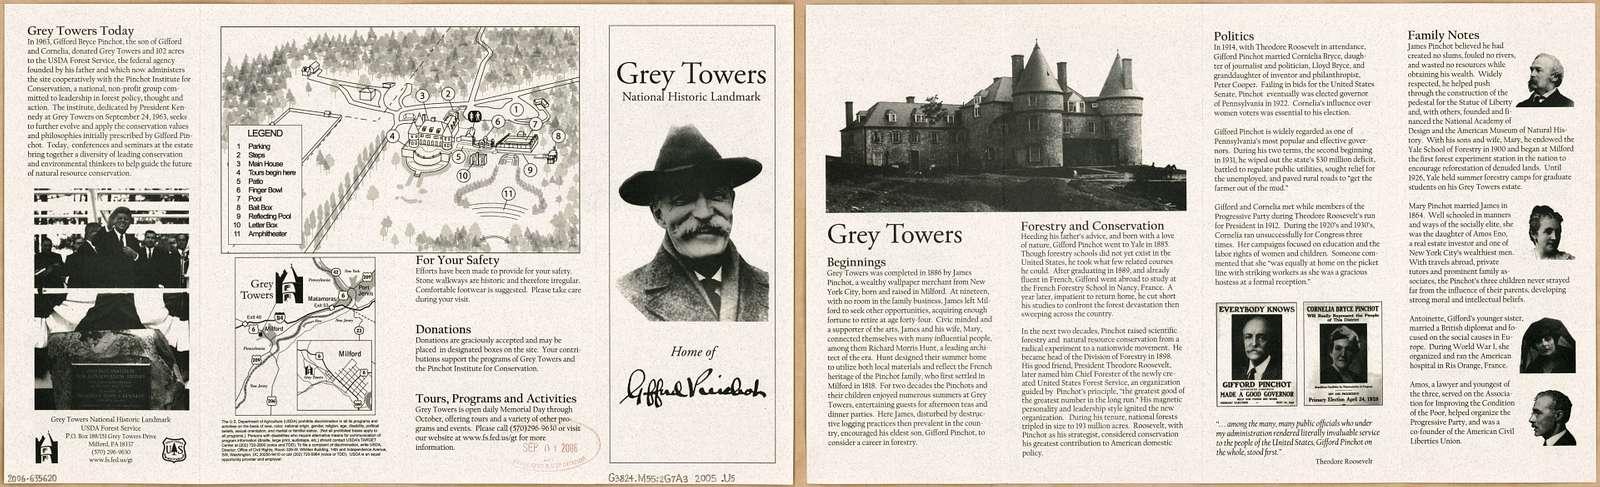 Grey Towers National Historic Landmark : home of Gifford Pinchot